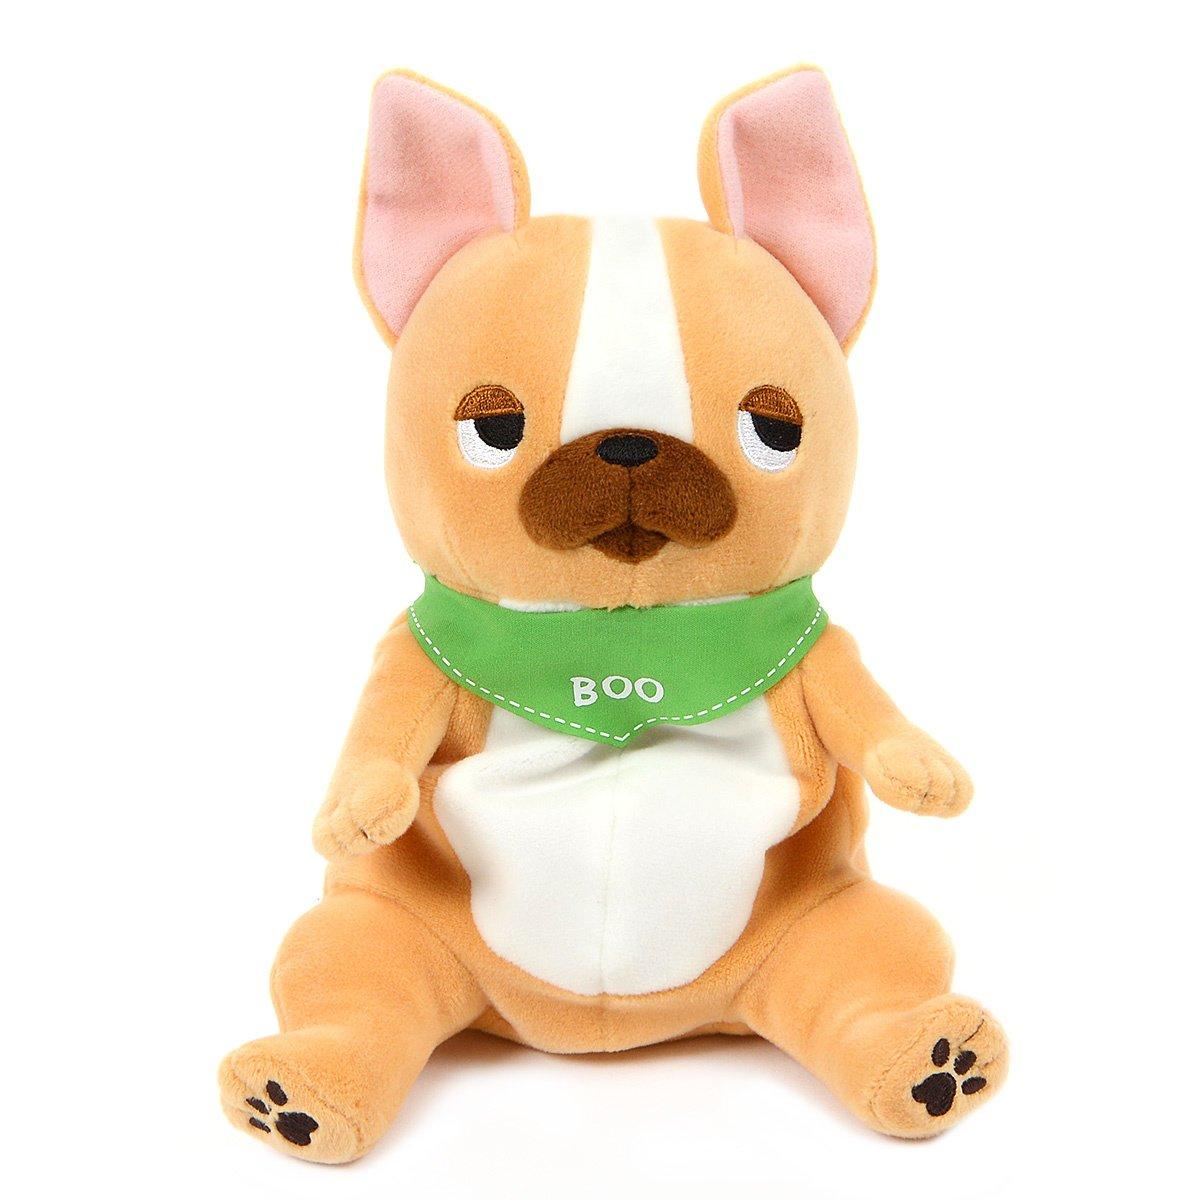 Plush Pug, Amuse, Buruburu Boo!, Gabugabu, Brown, 7 Inches